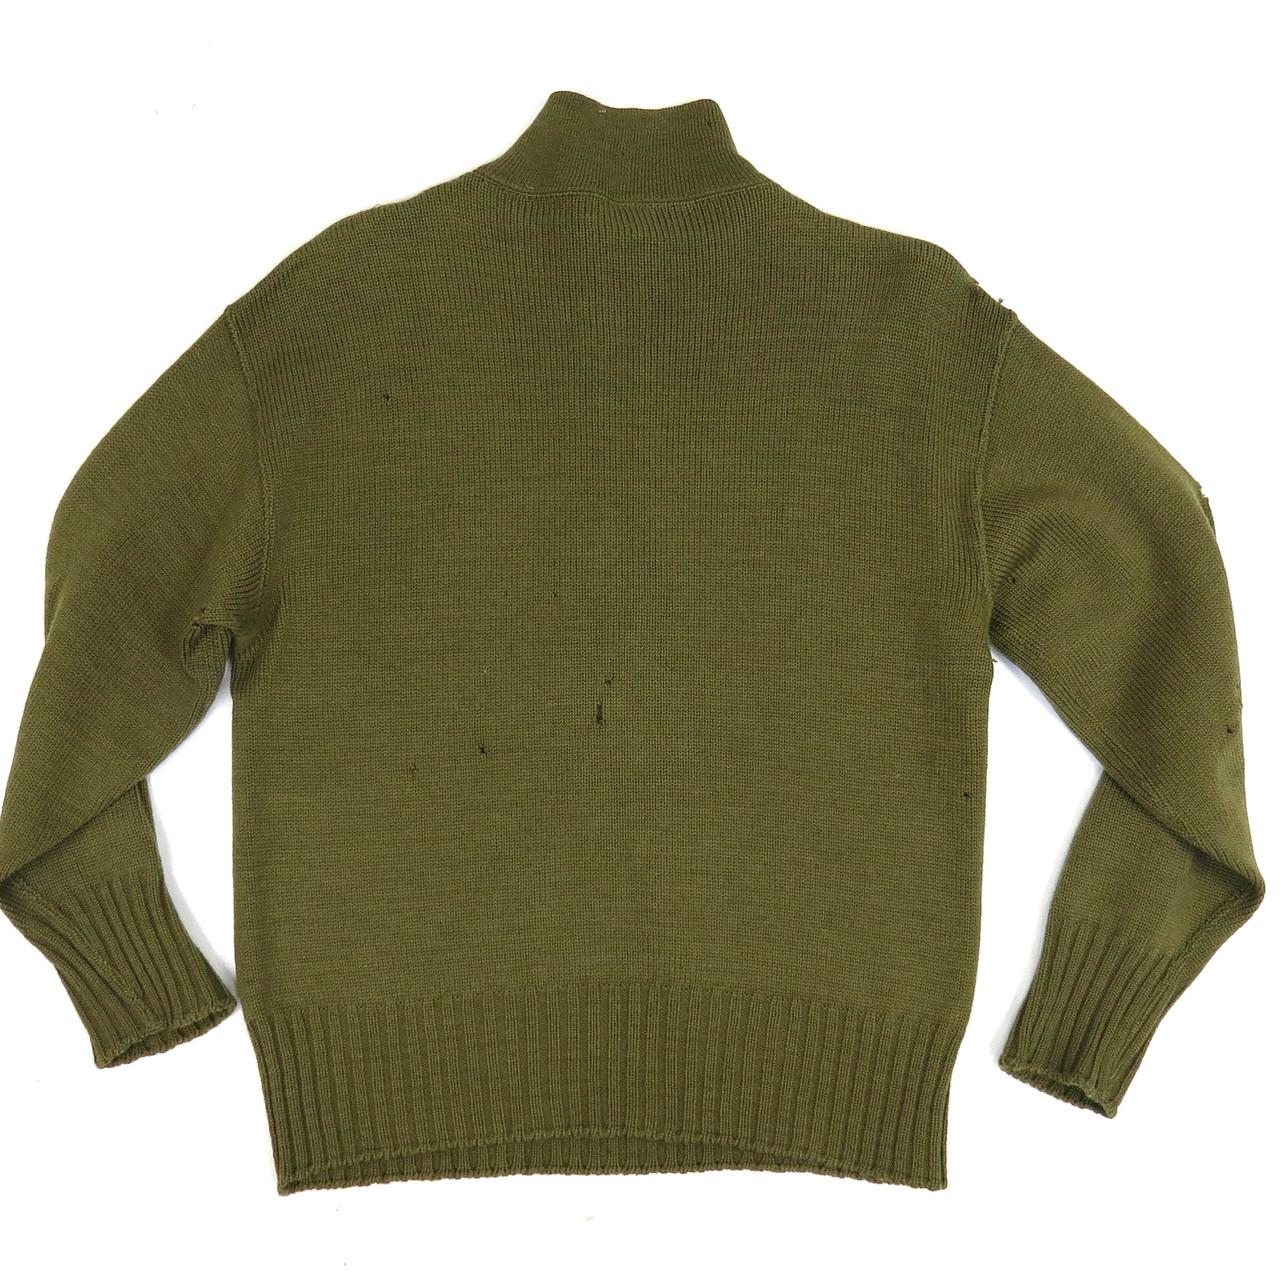 WWII Army Sweater